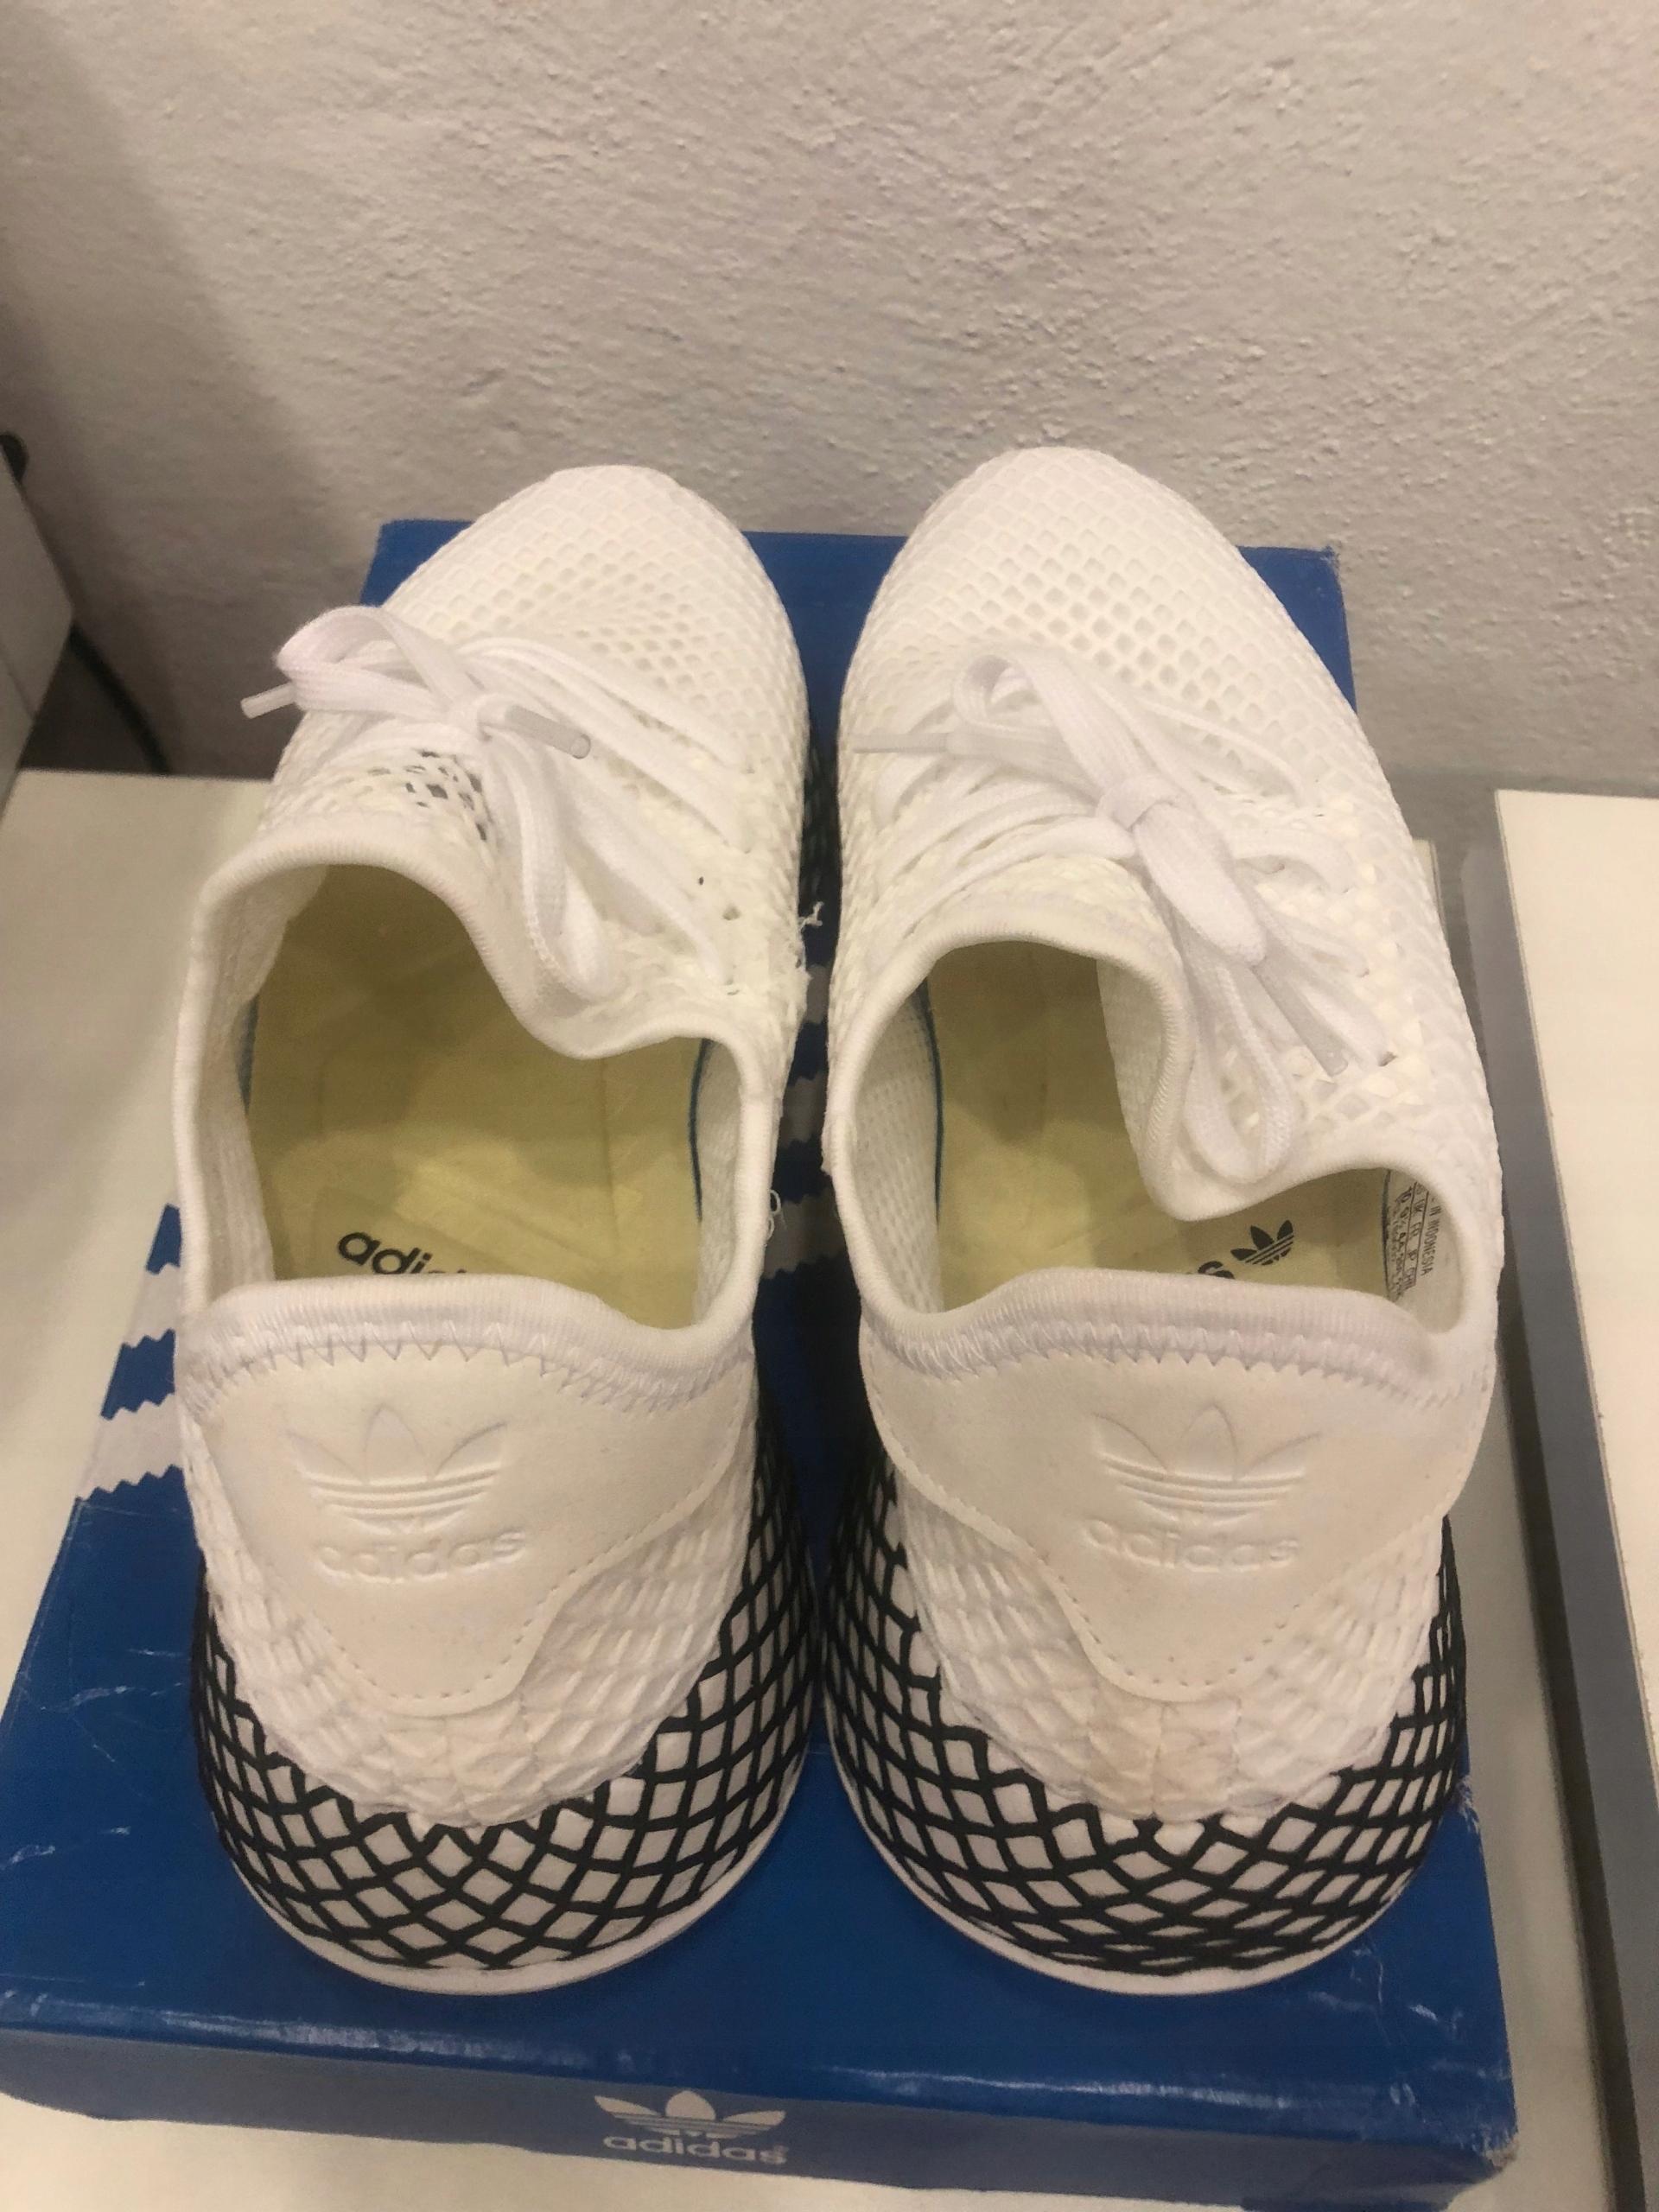 Buty adidas Deerupt Runner B41767 r. 44 UŻYWANE